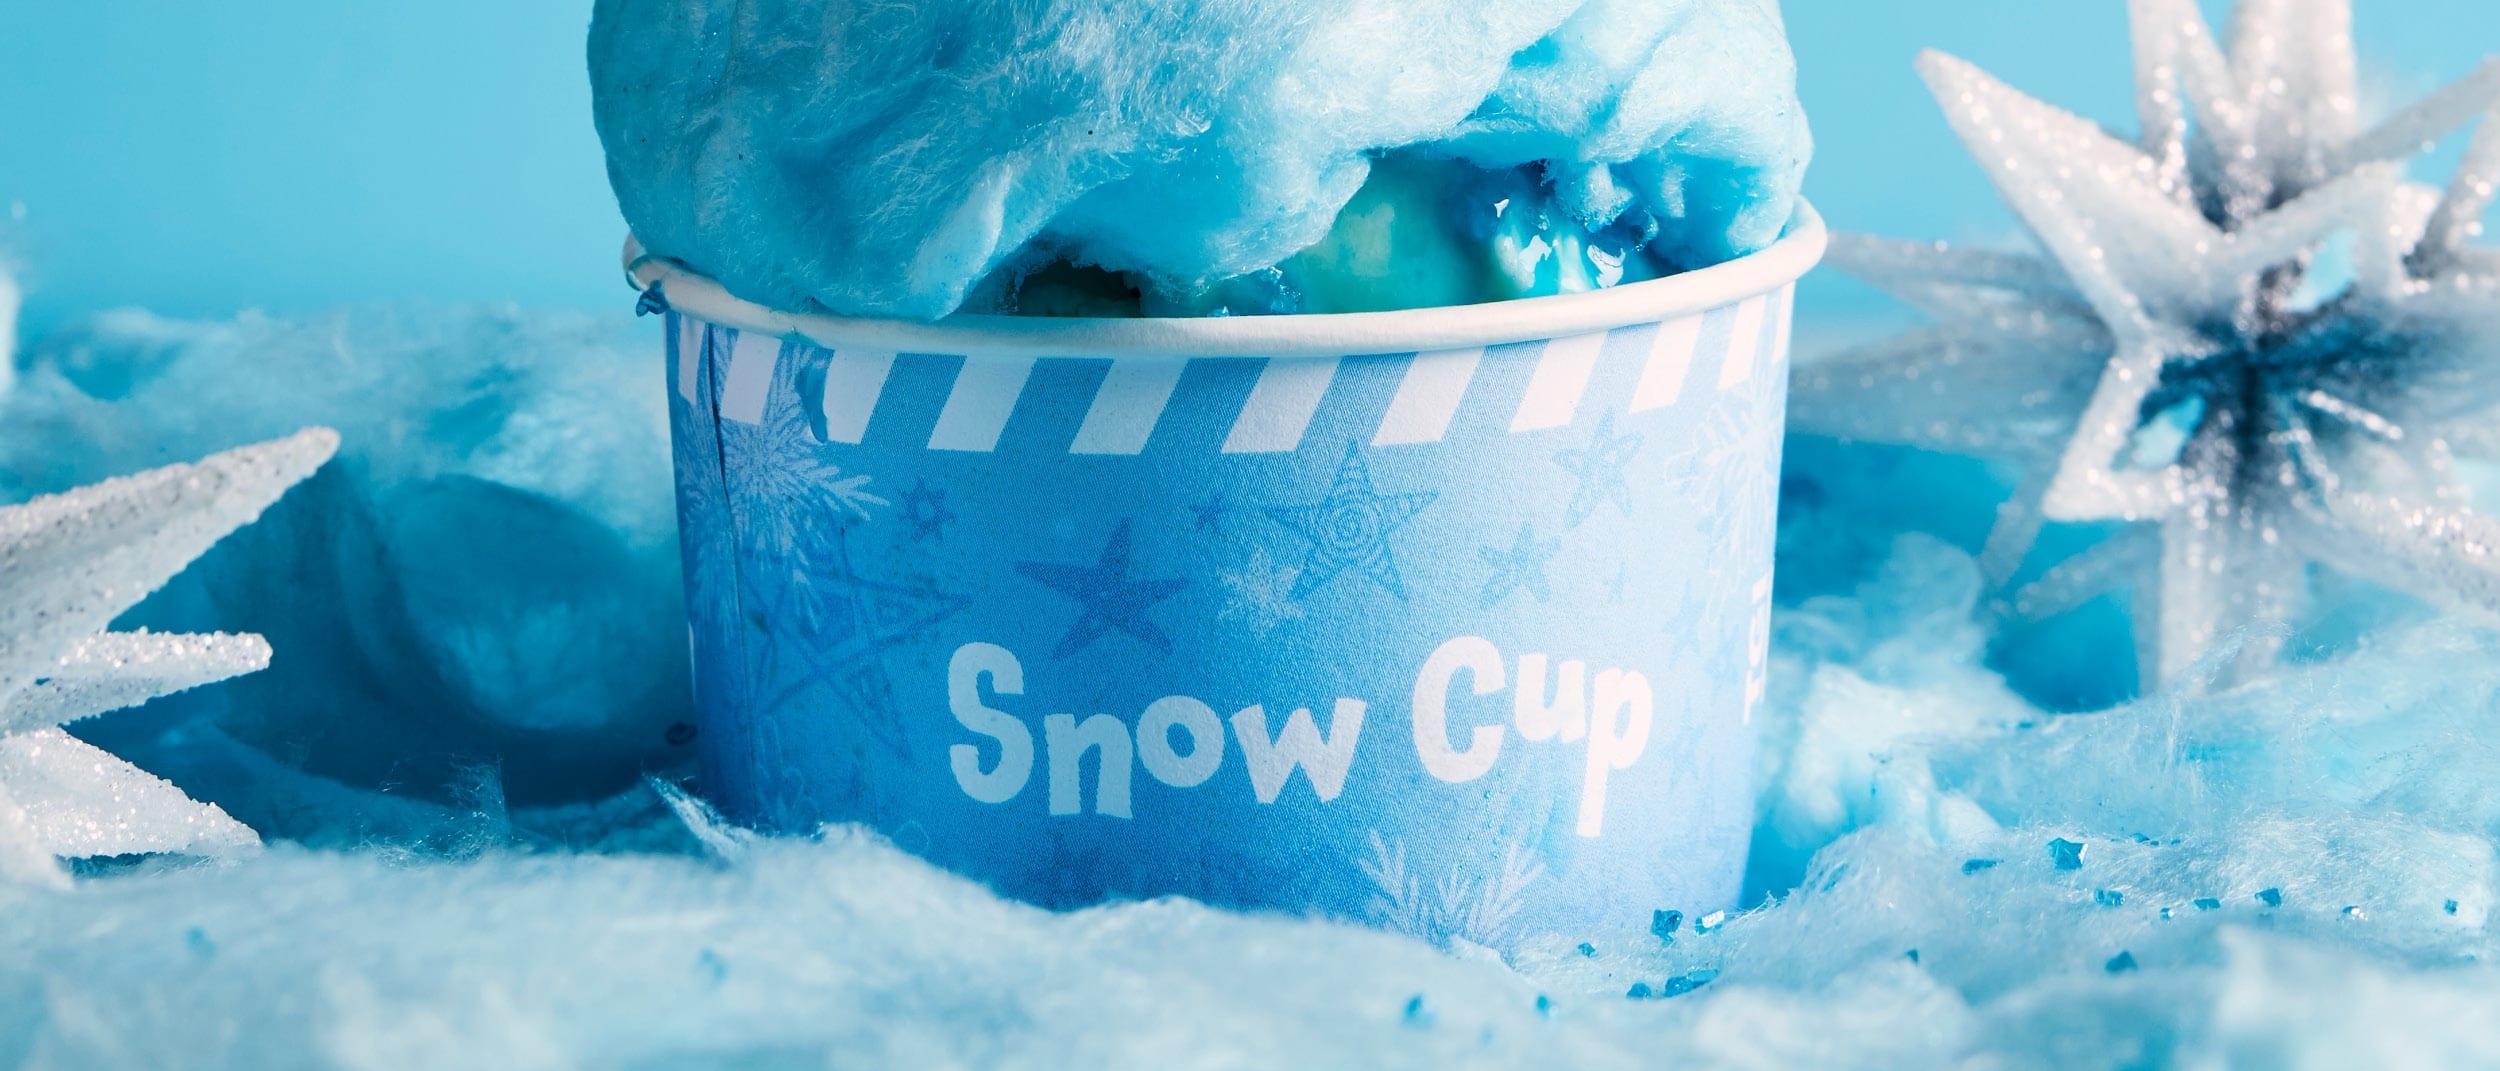 TGI Fridays: Frozen snow cup